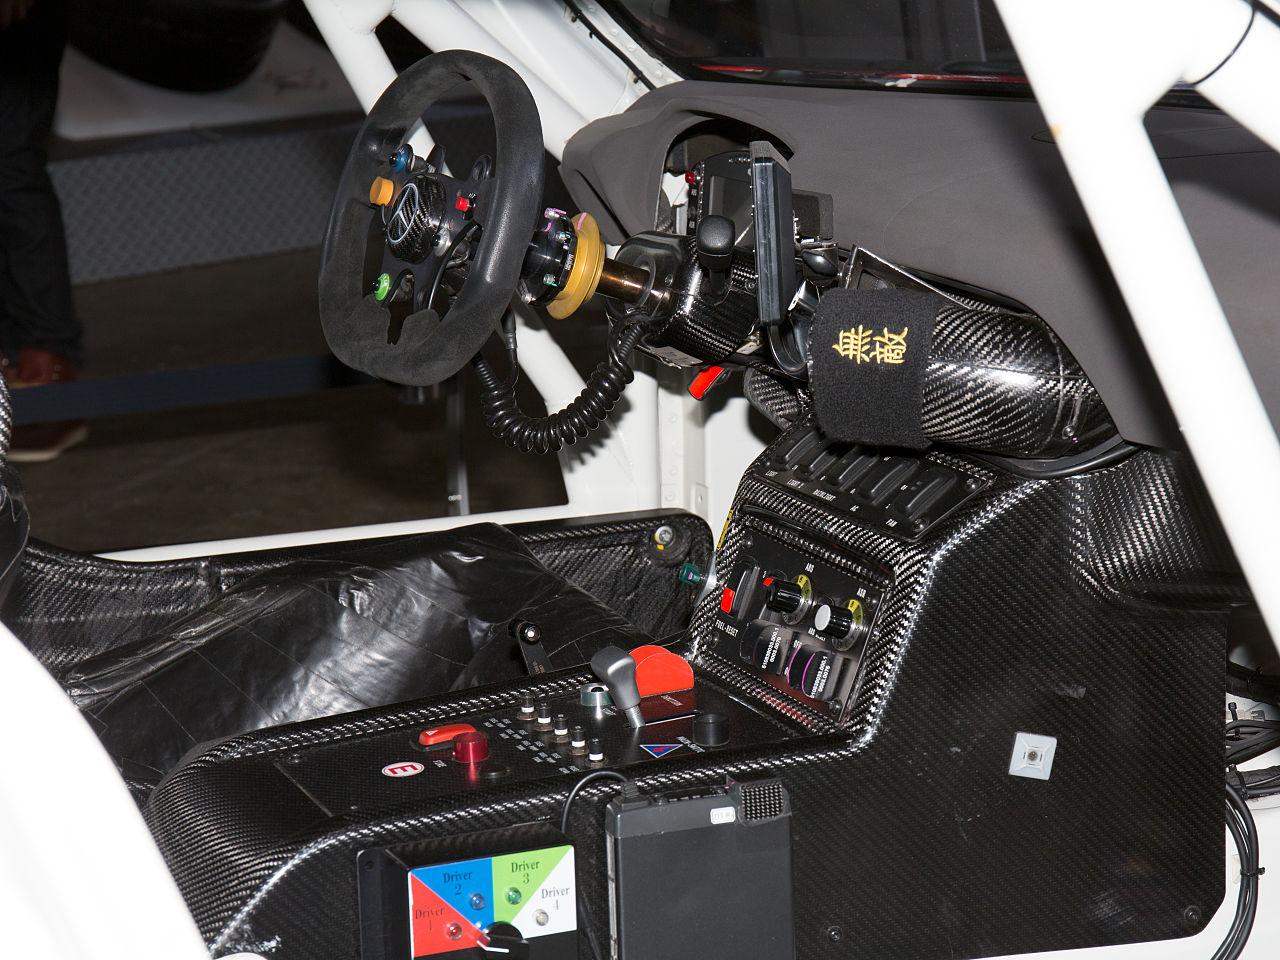 File:Mercedes-Benz SLS AMG GT3 cockpit 2015 Tokyo Auto Salon.jpg ... | {Auto cockpit 43}